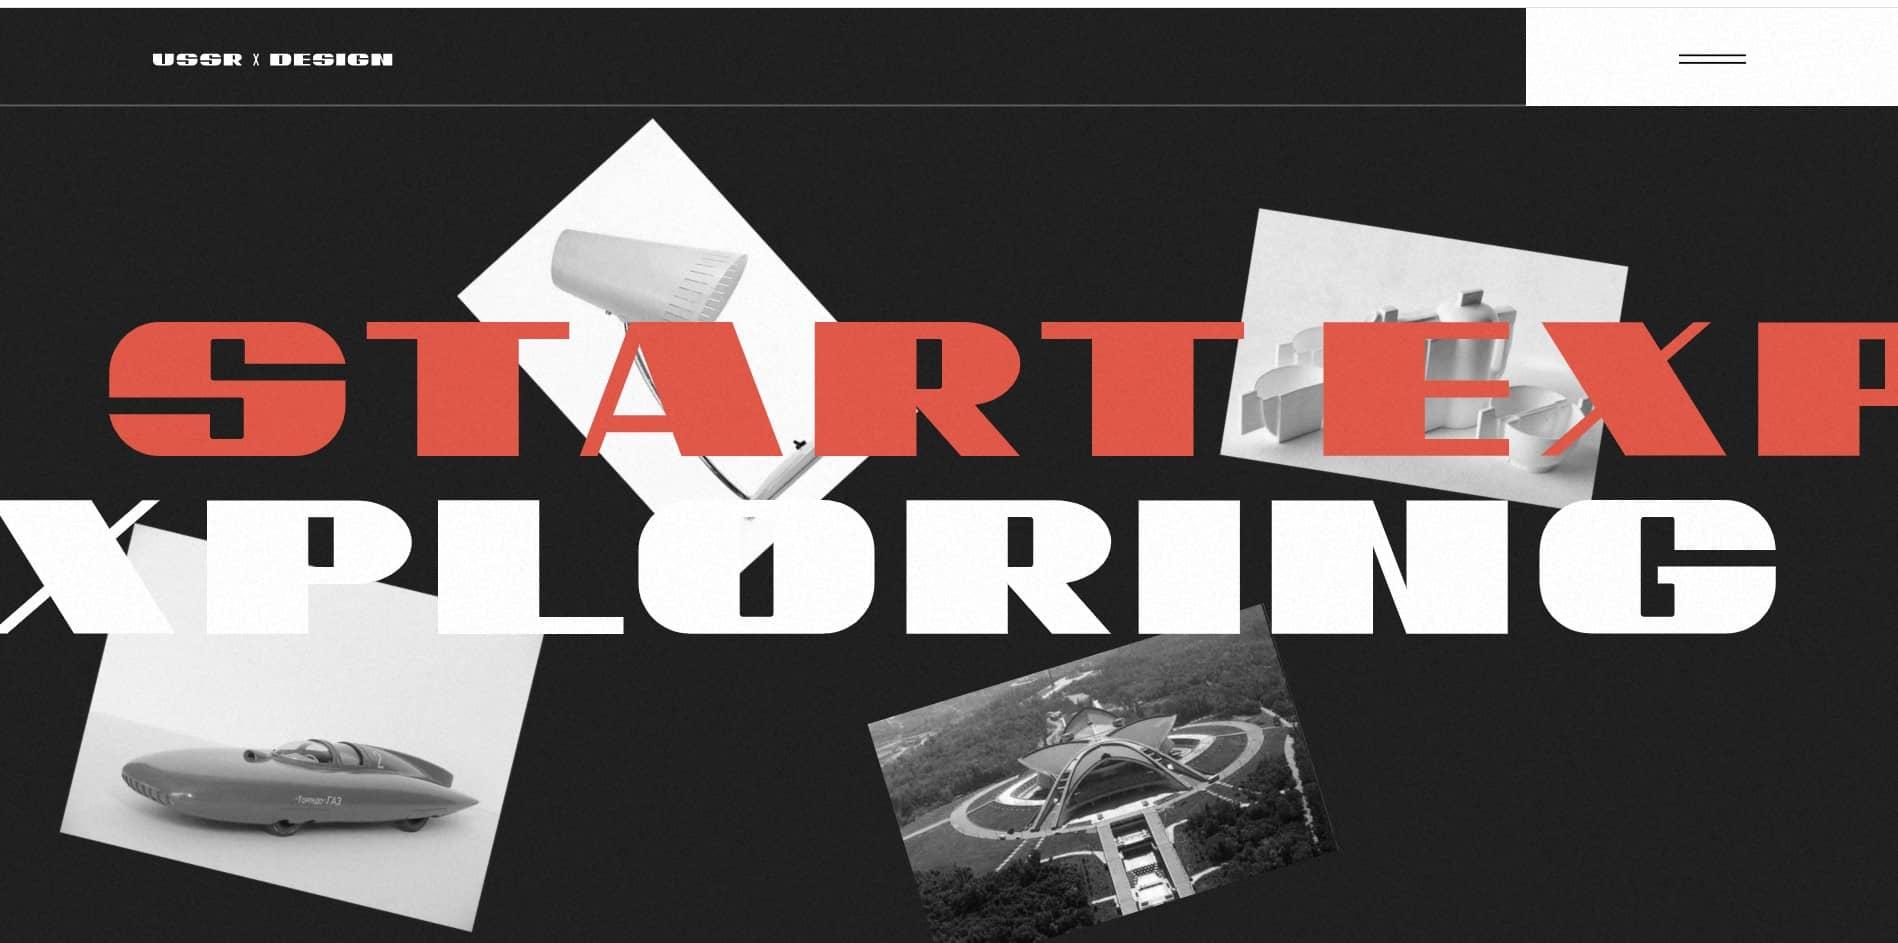 tipografia-drammatica-minimalista